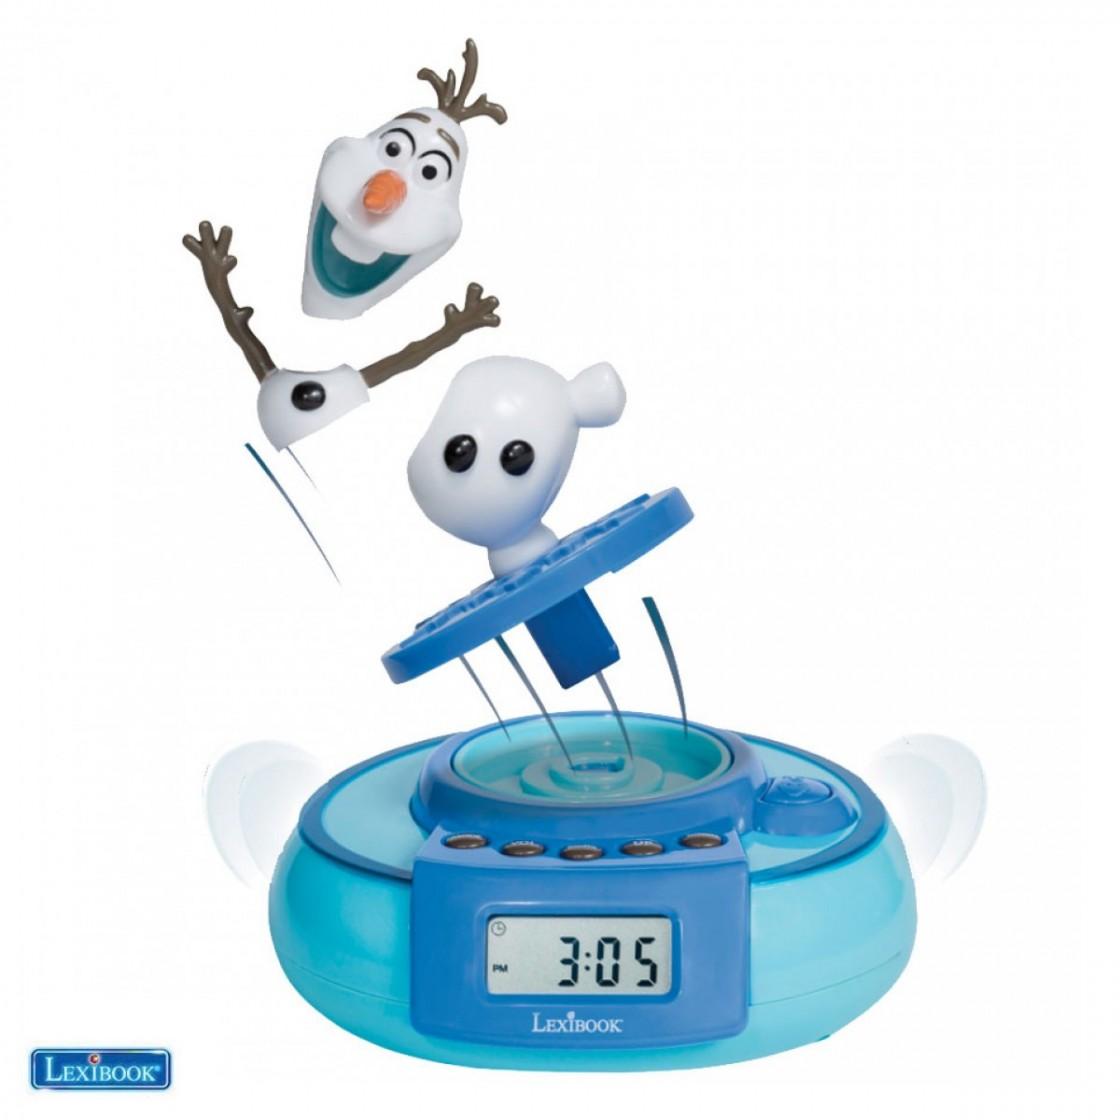 lexibook frozen projector alarm clock instructions